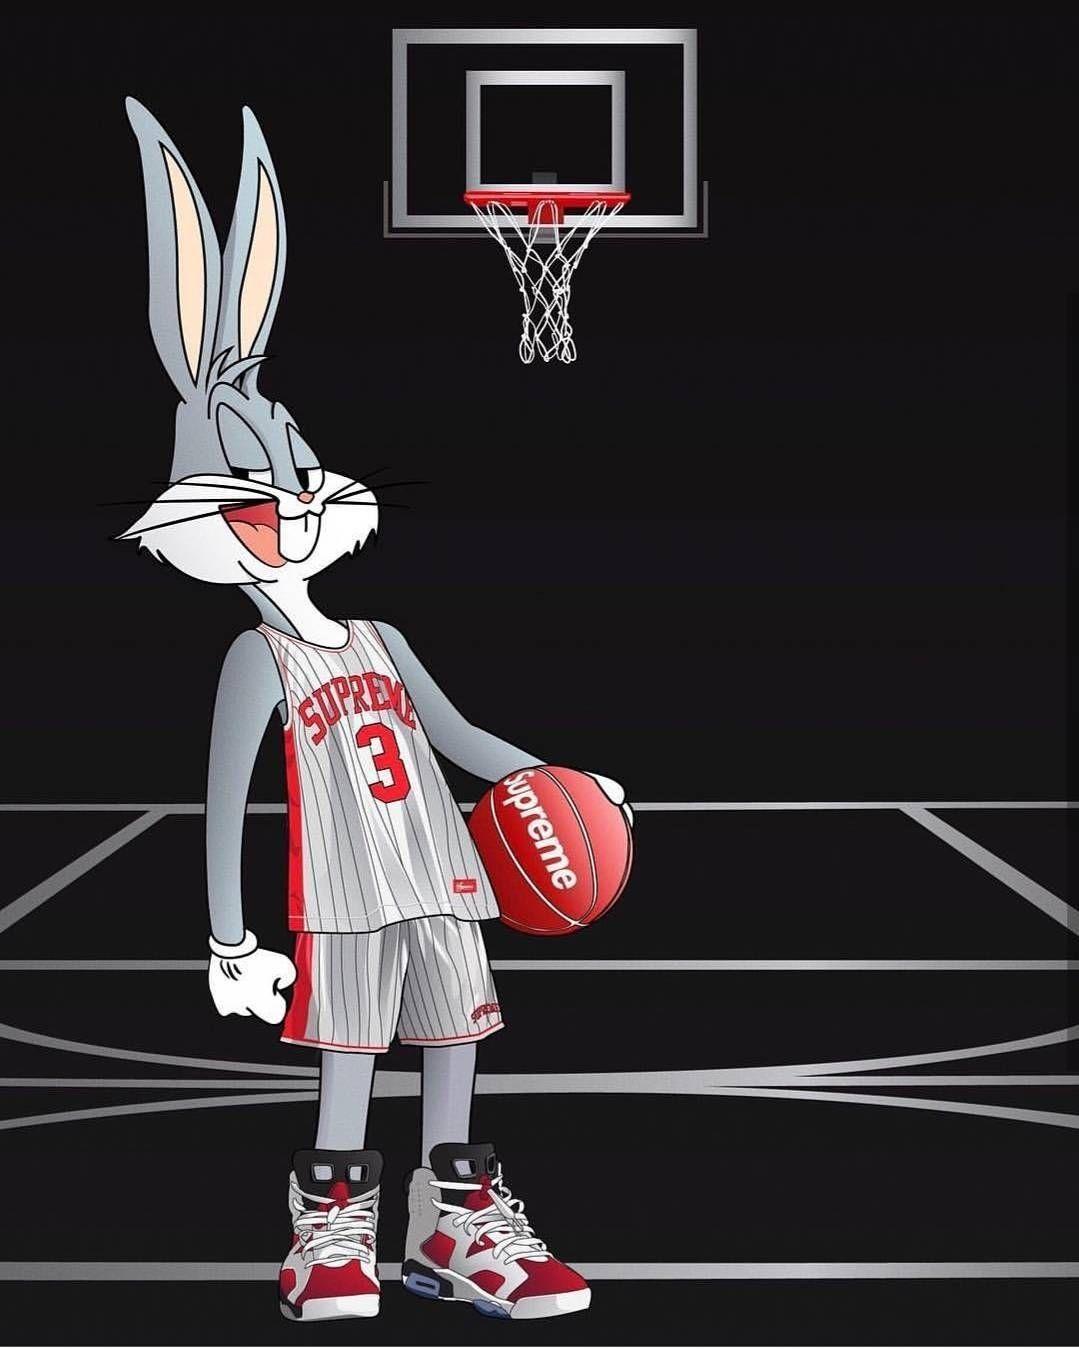 NBA Supreme Wallpapers - Top Free NBA